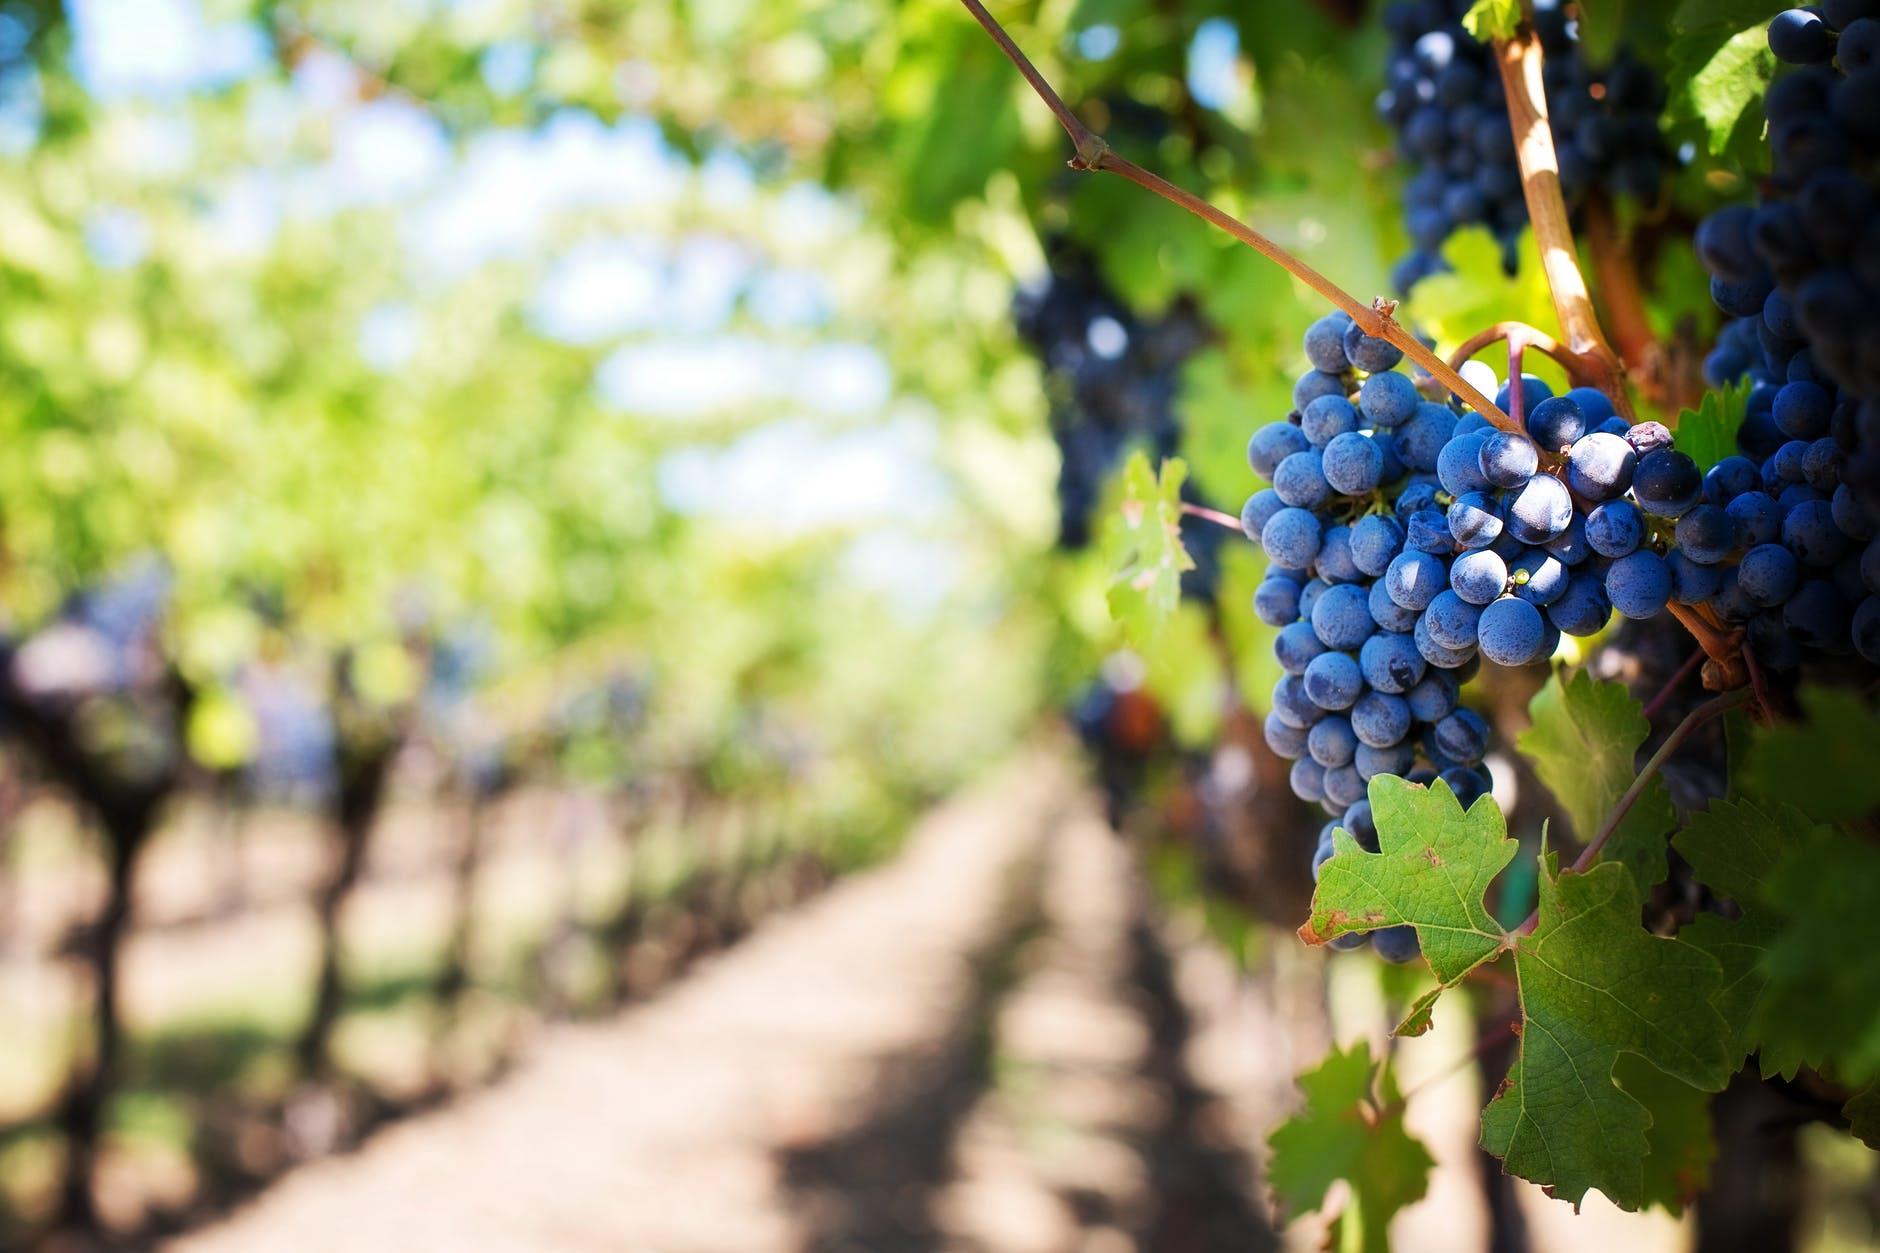 Types of organic farming 2021